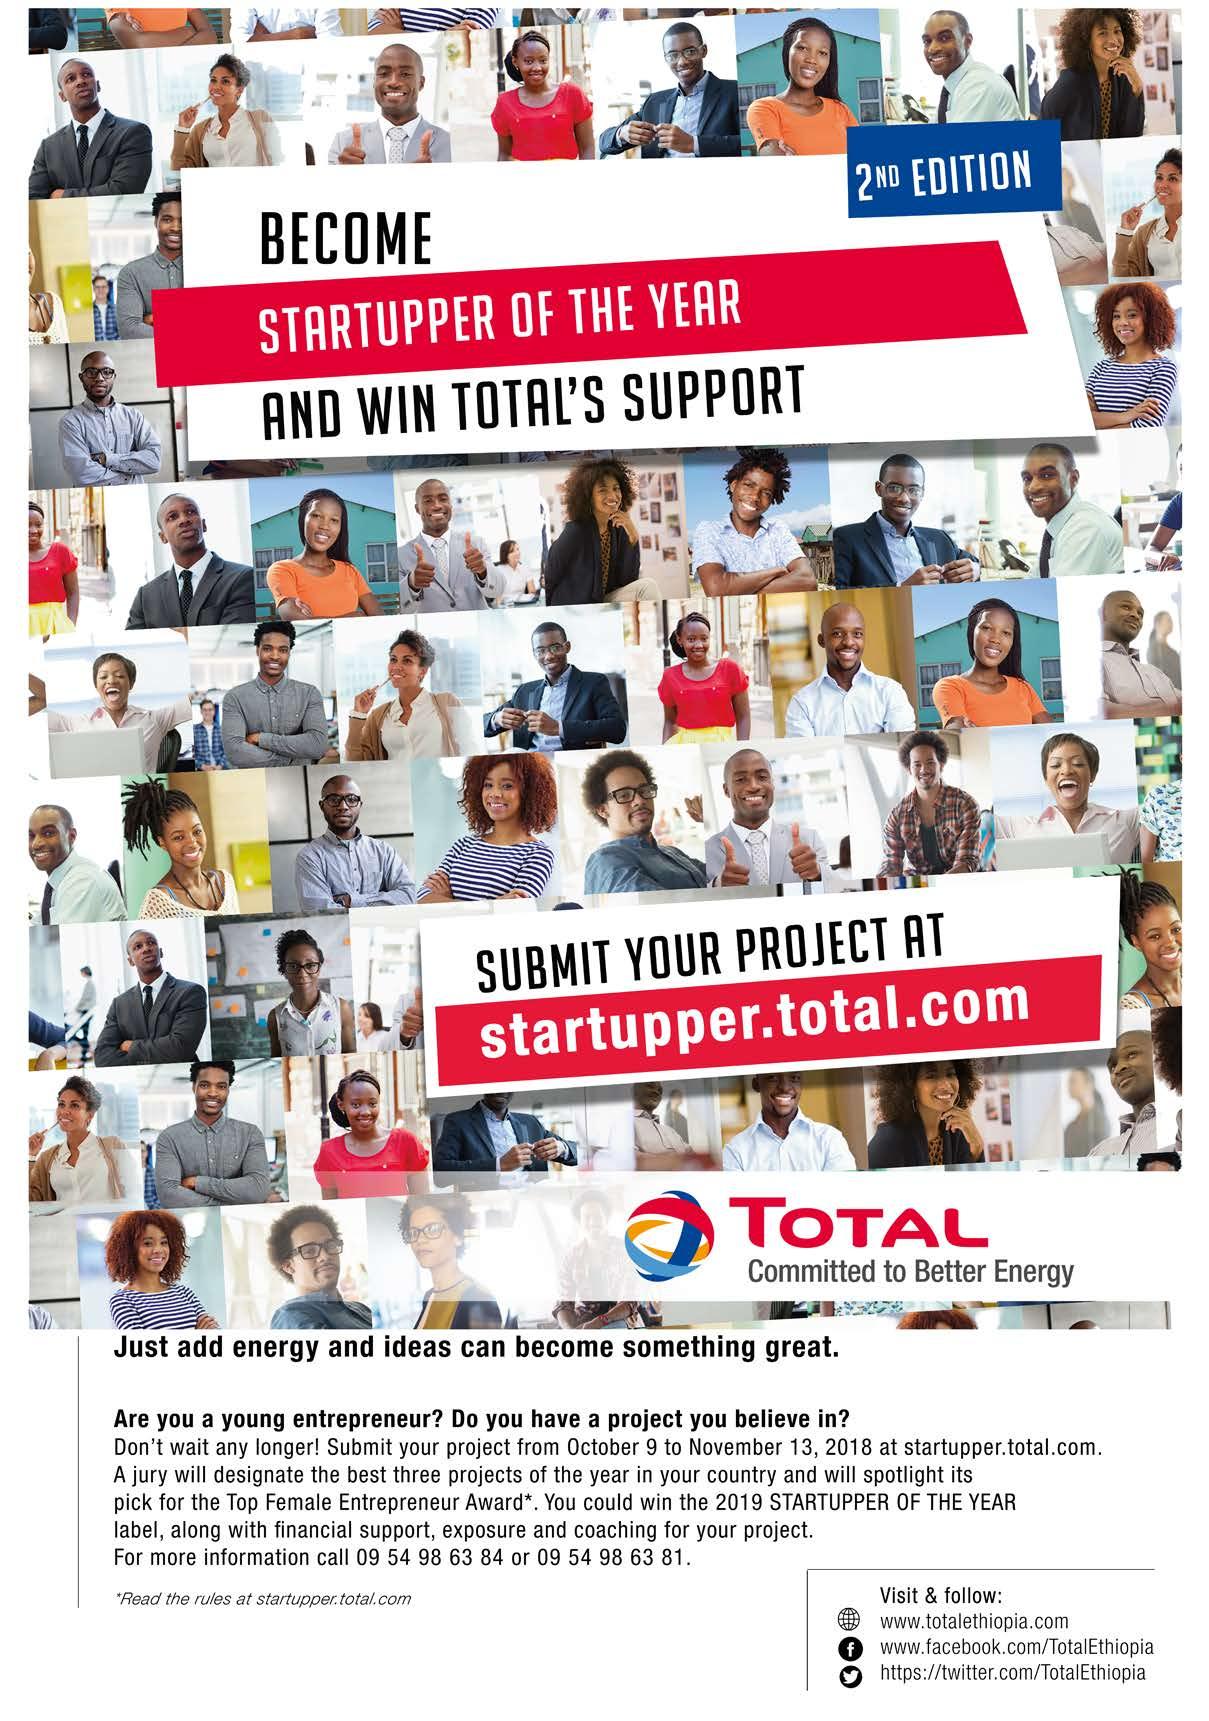 TOTAL Kicks off Startupper 2018